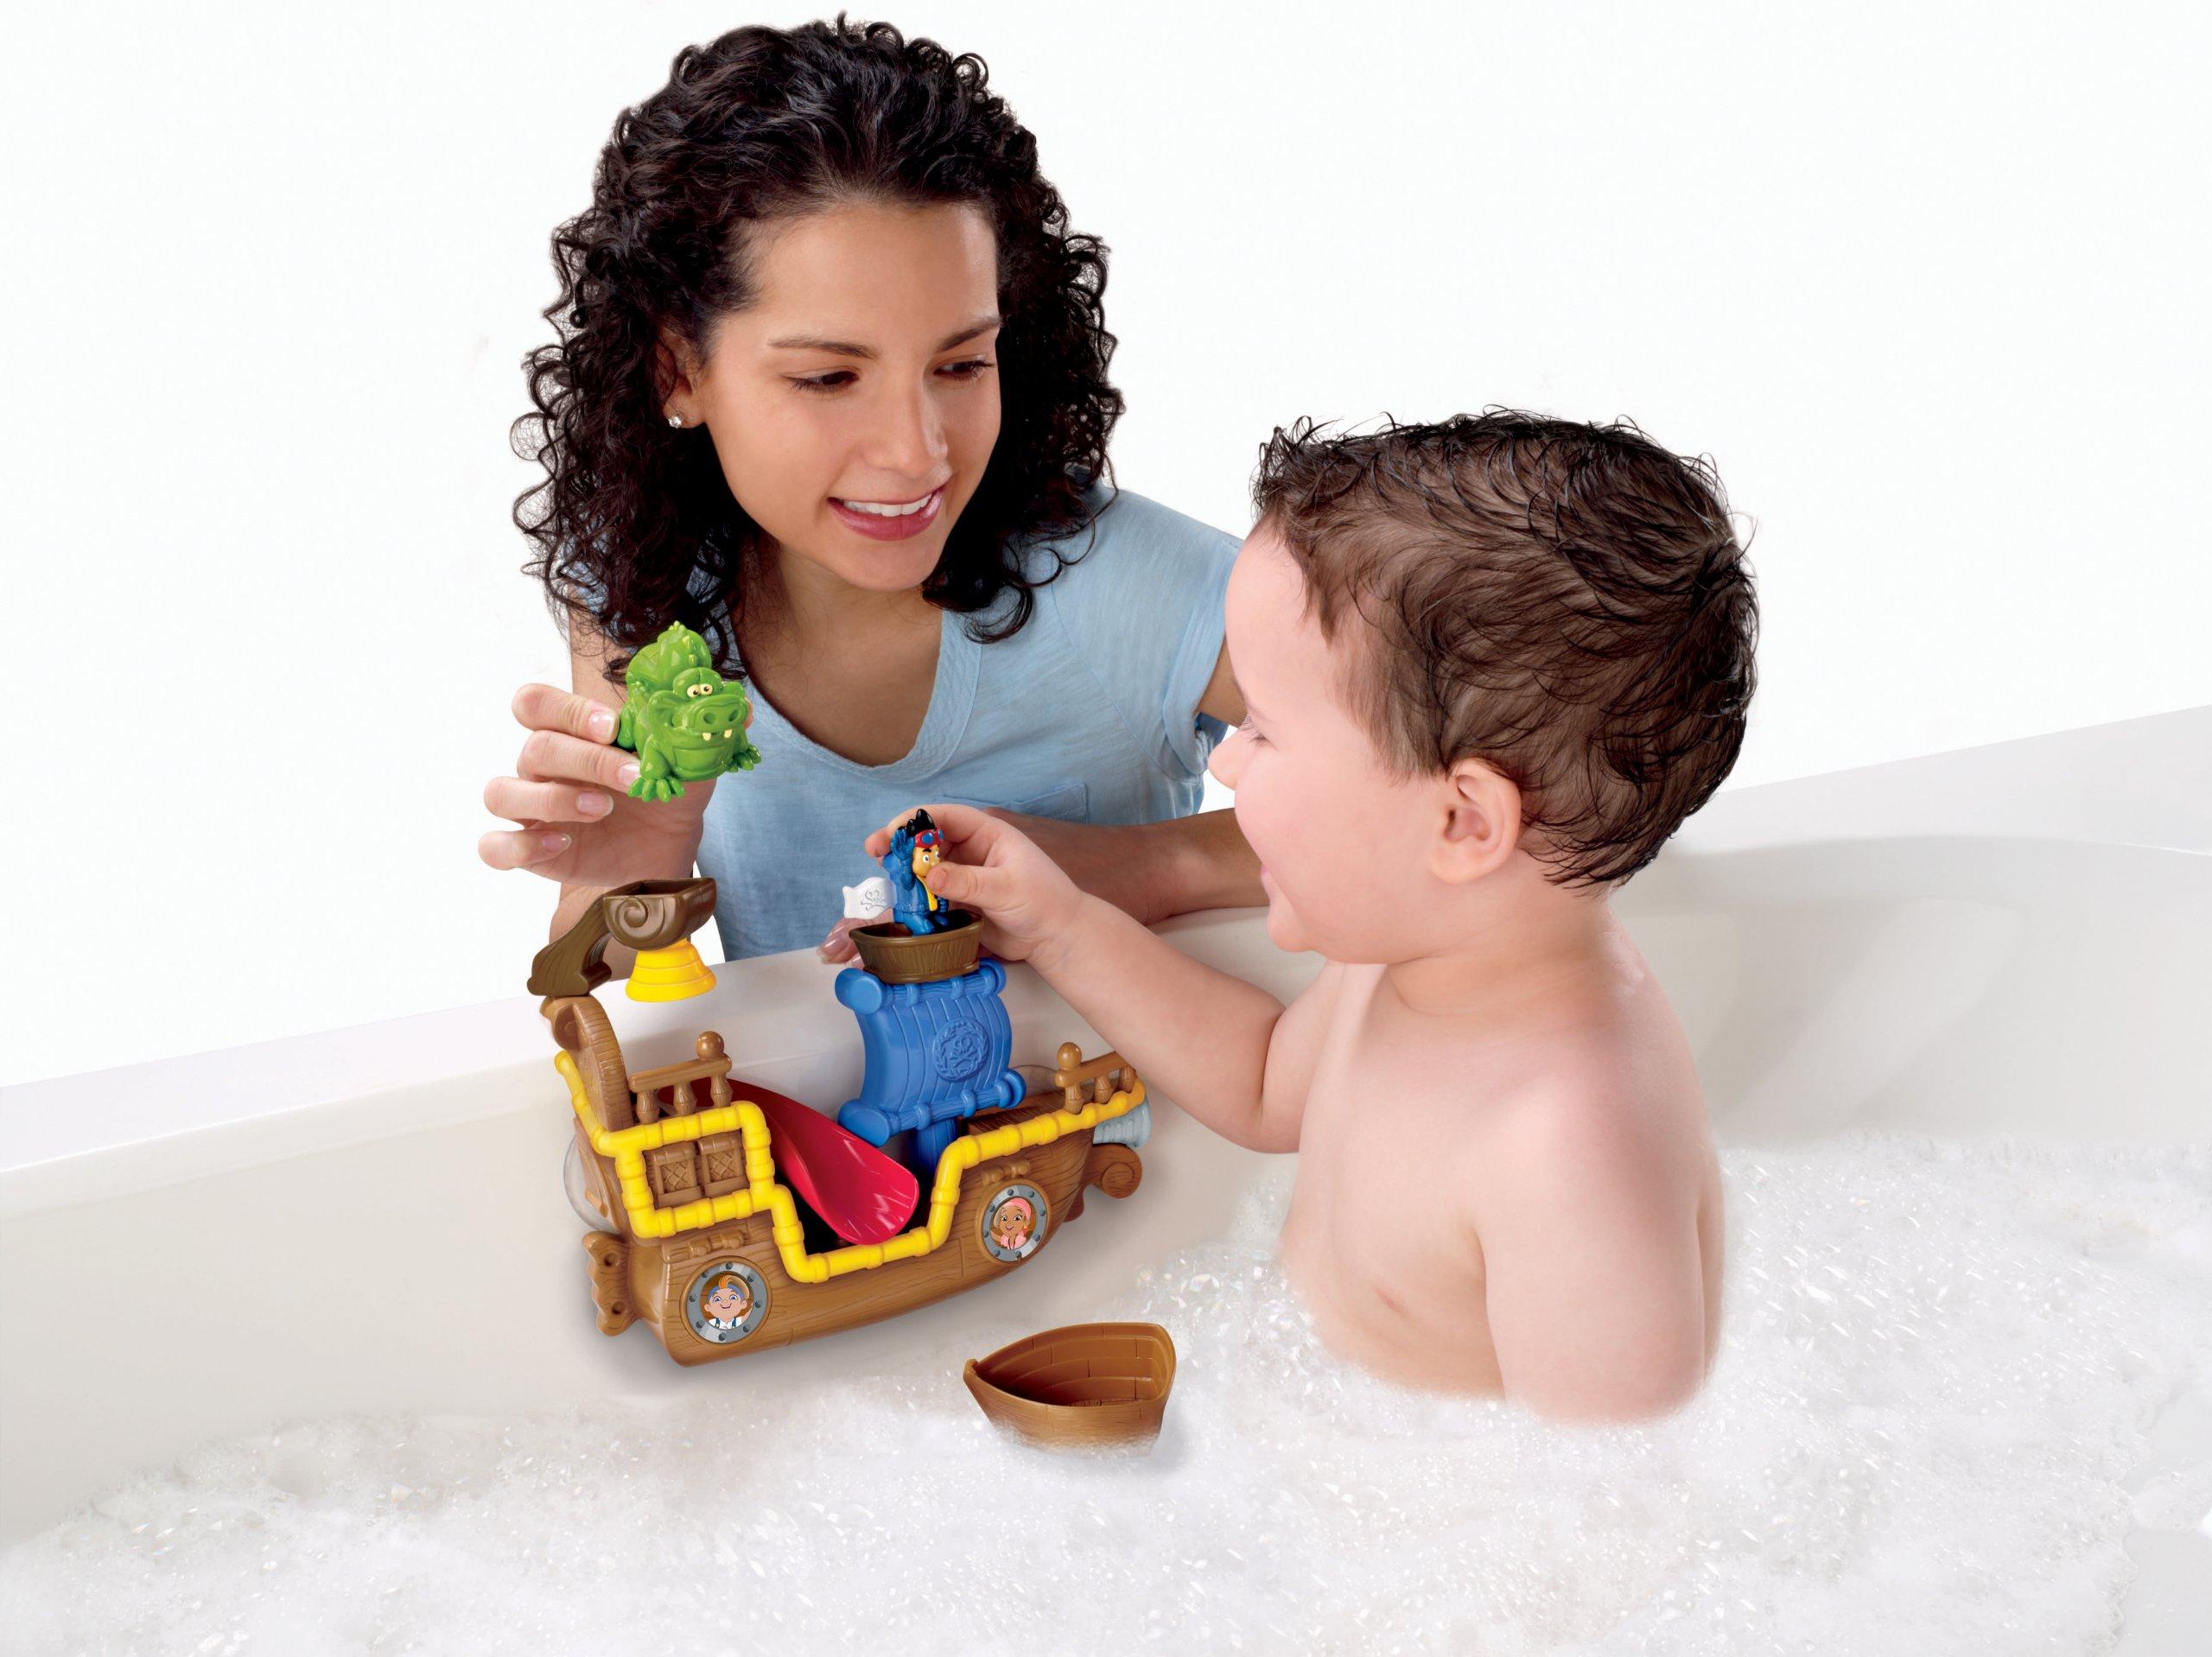 Fisher-Price Jake and the Never Land Pirates Splashin' Bucky Bath by Fisher-Price (Image #3)